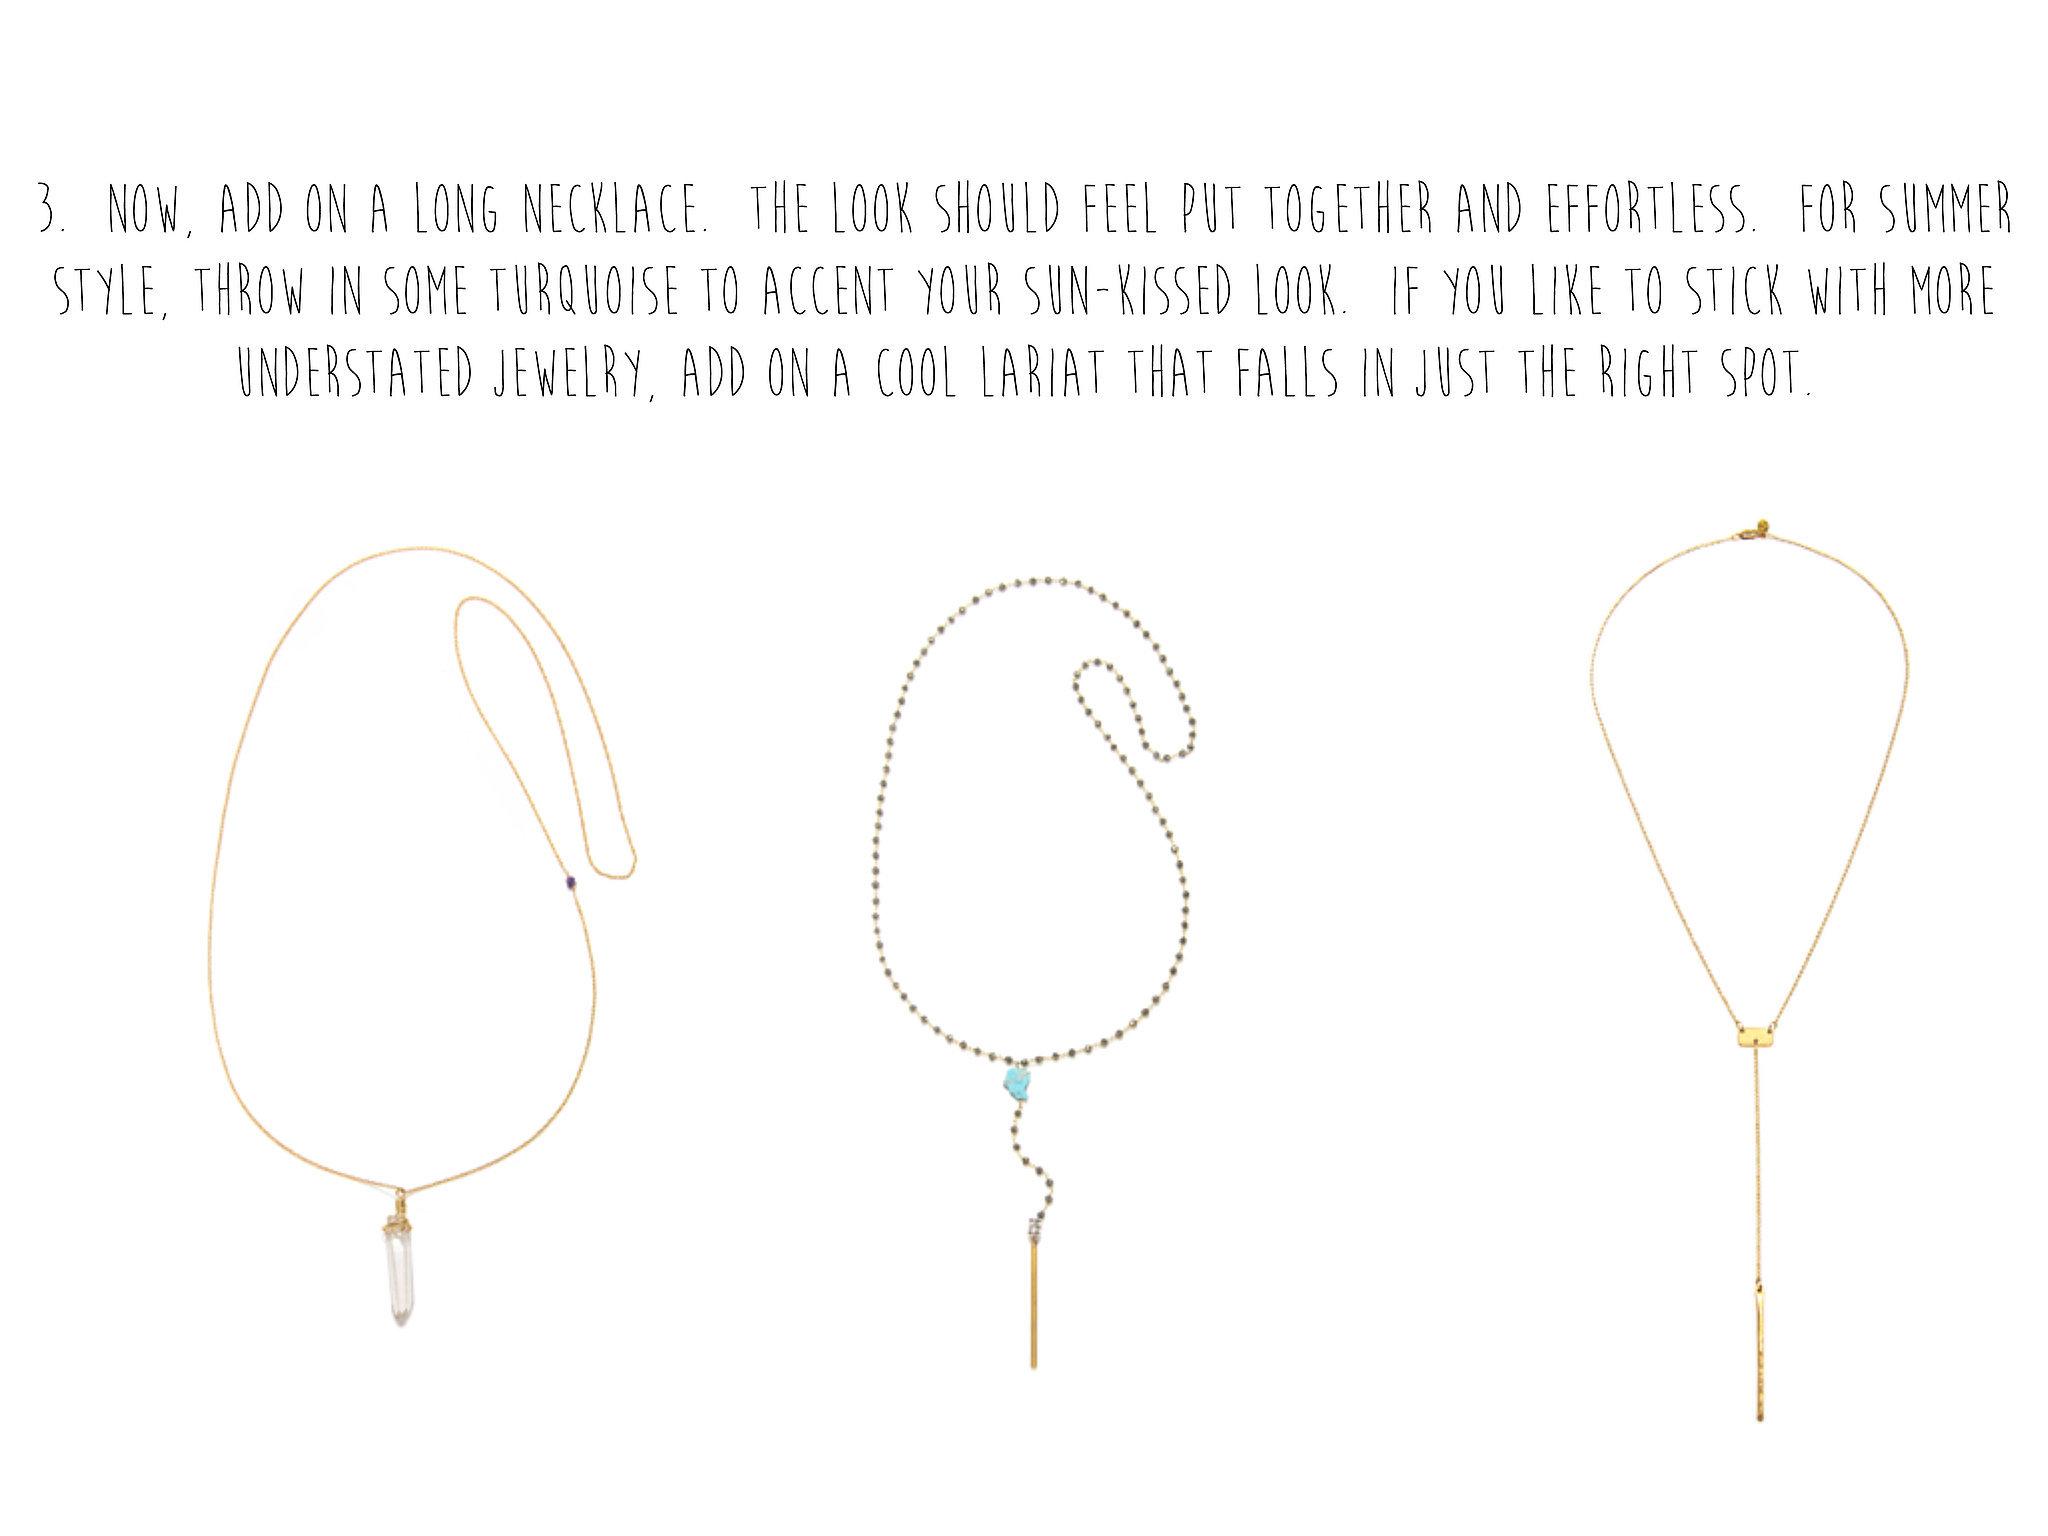 Add a Third, Longer Necklace